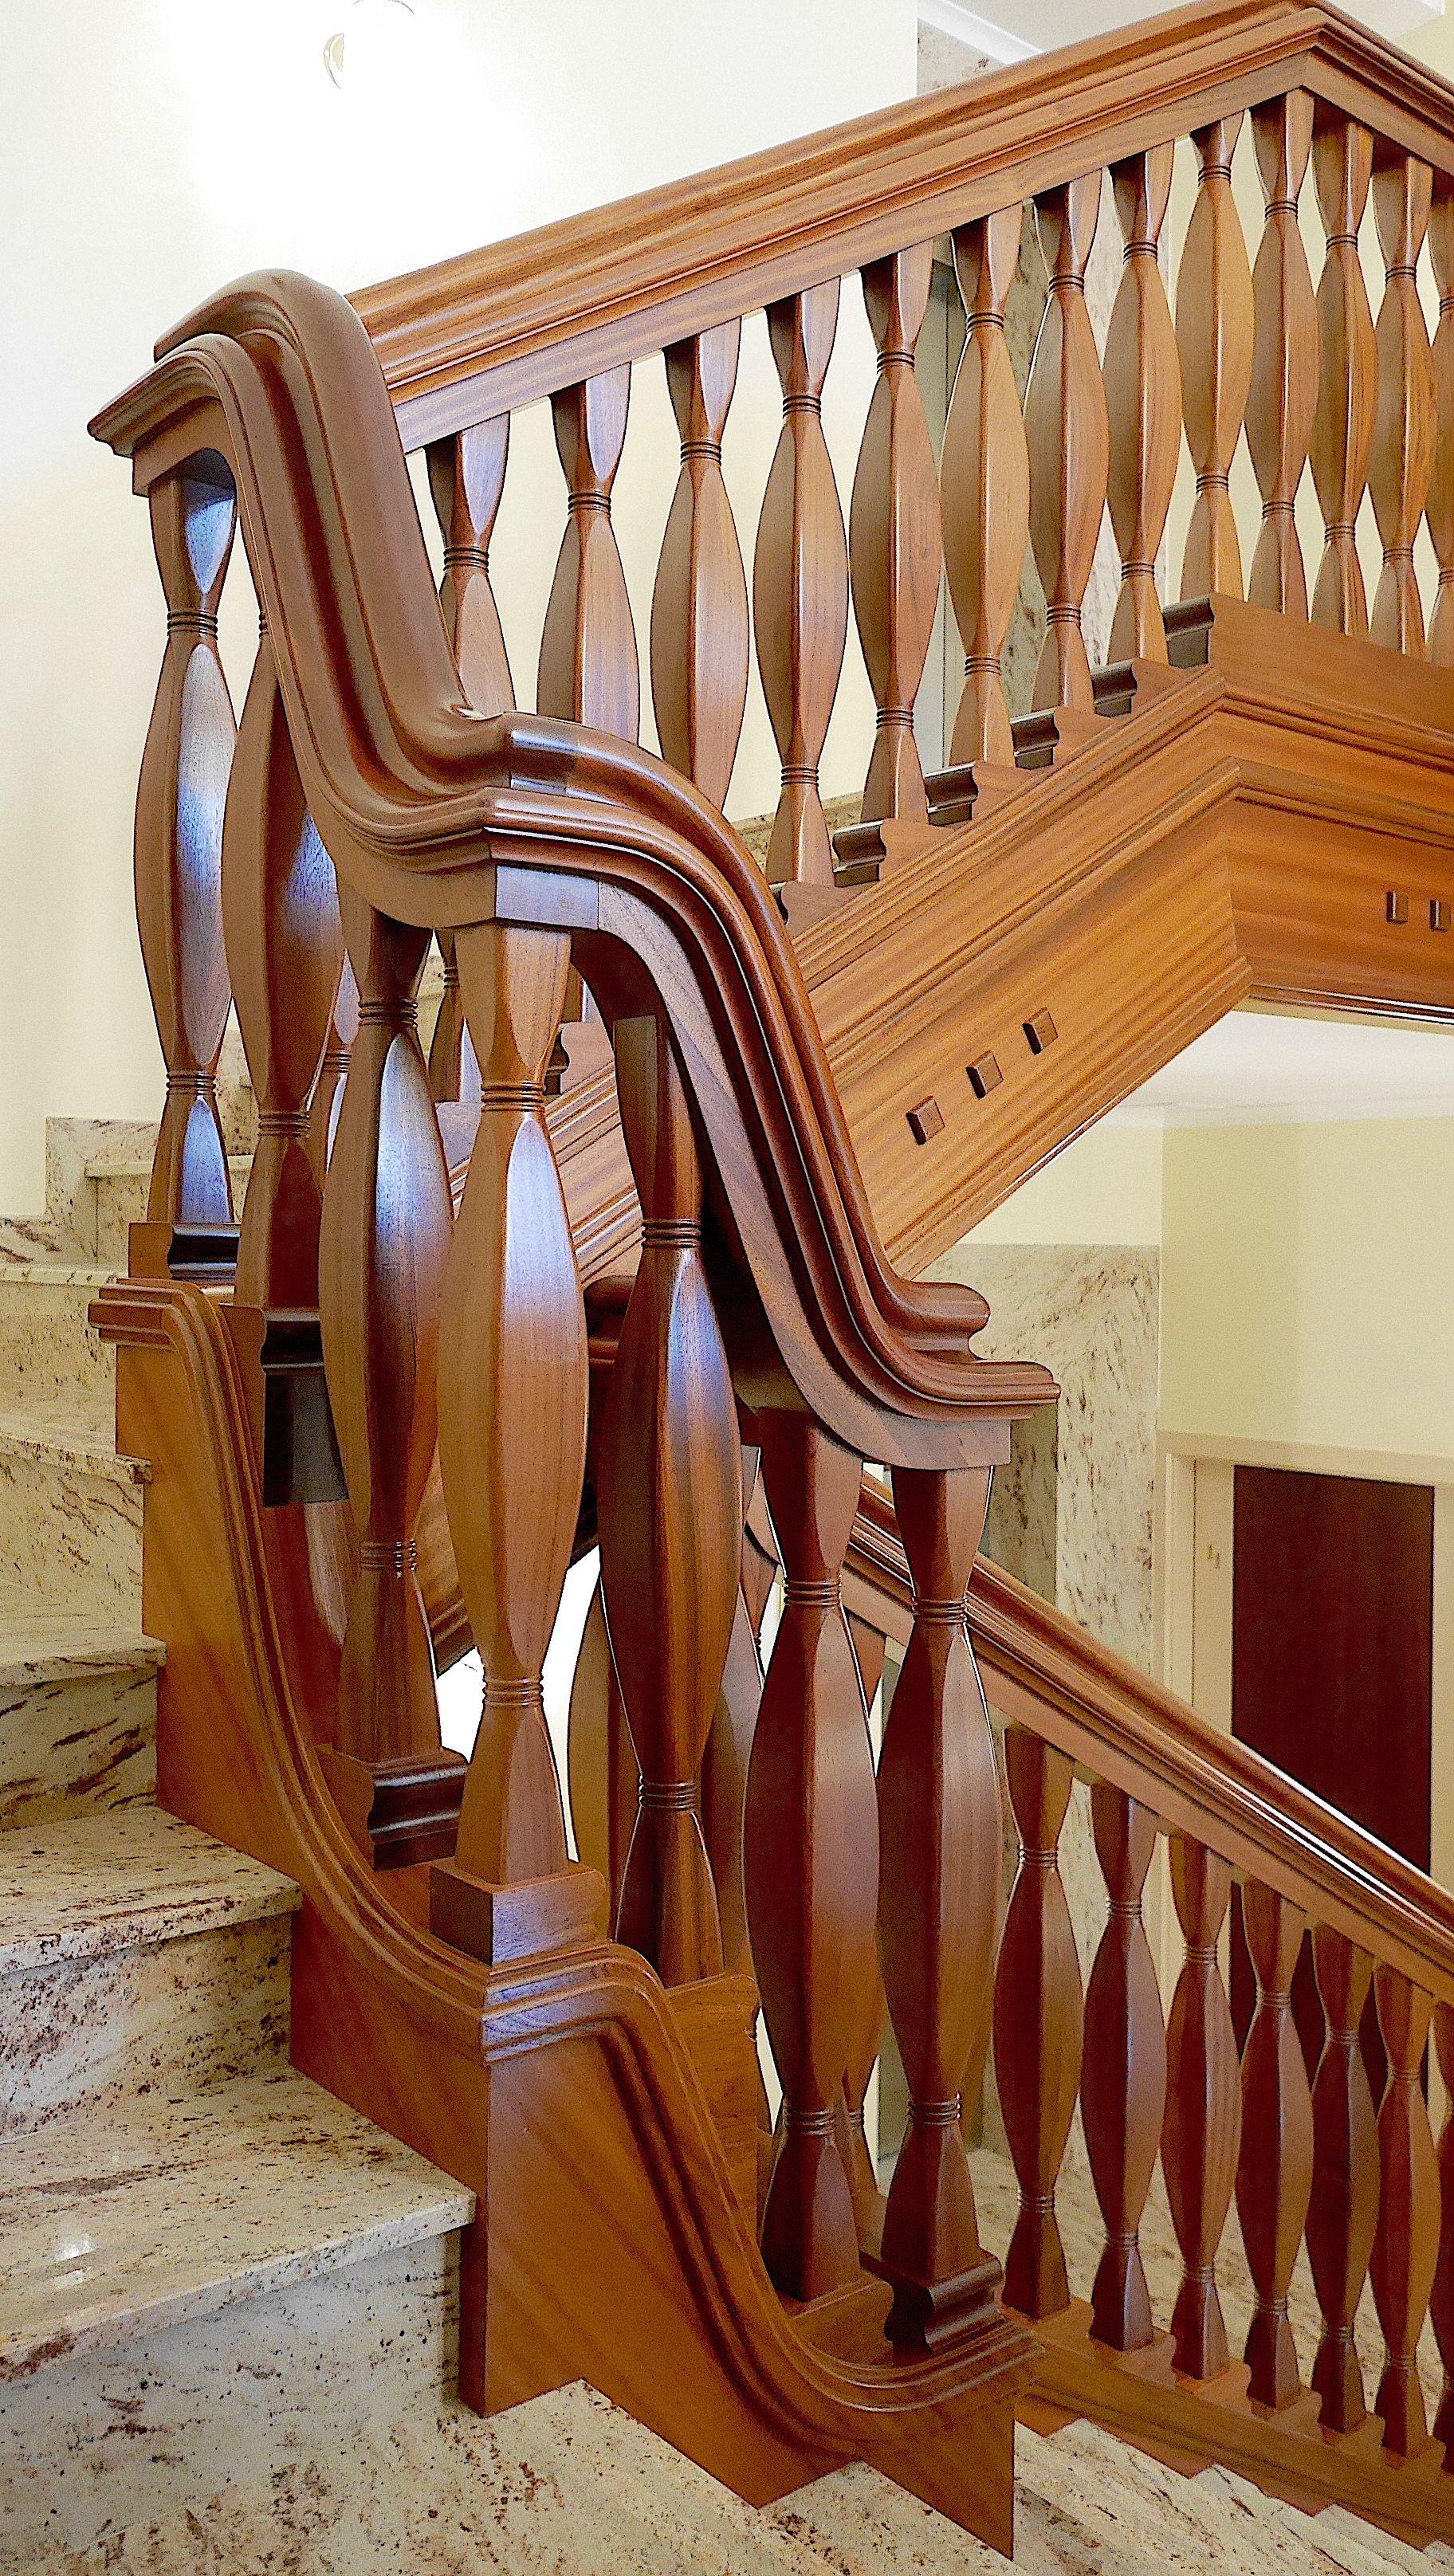 Best Pin By Vasili Ogurtsov On Лестницы Staircase Railing Design 400 x 300